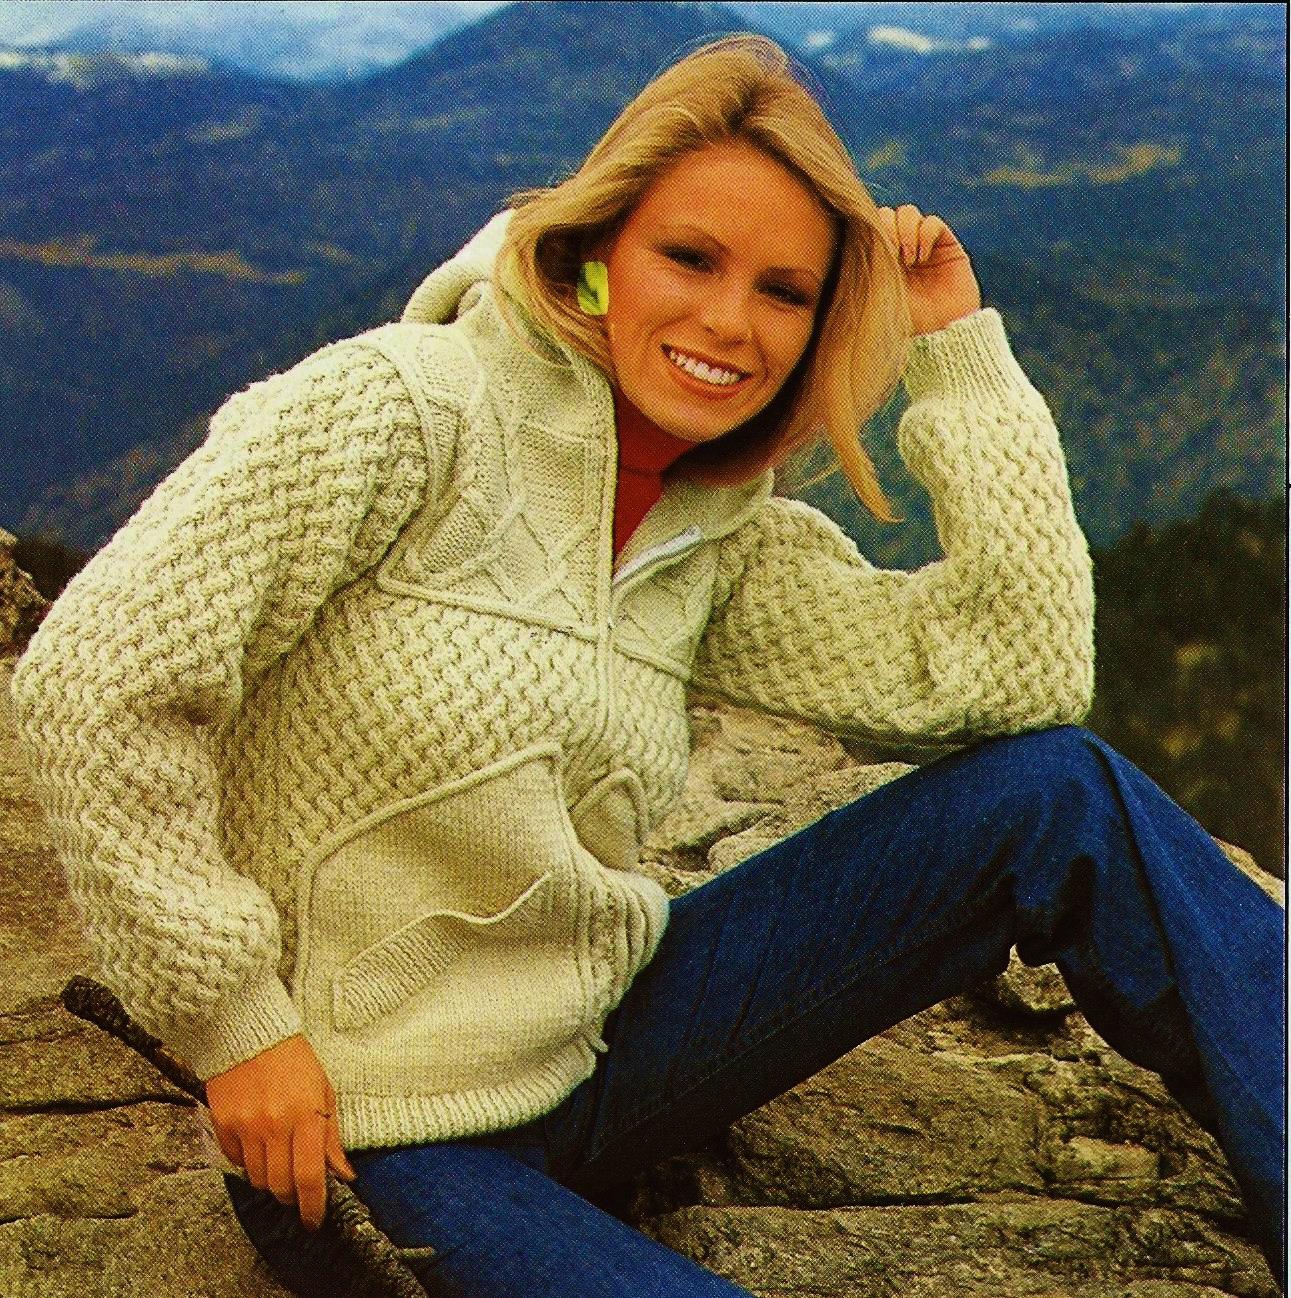 Knitting Pattern Ladies Hooded Jacket : DIY Hooded Aran Cable Knit Jacket PDF Vintage by ...